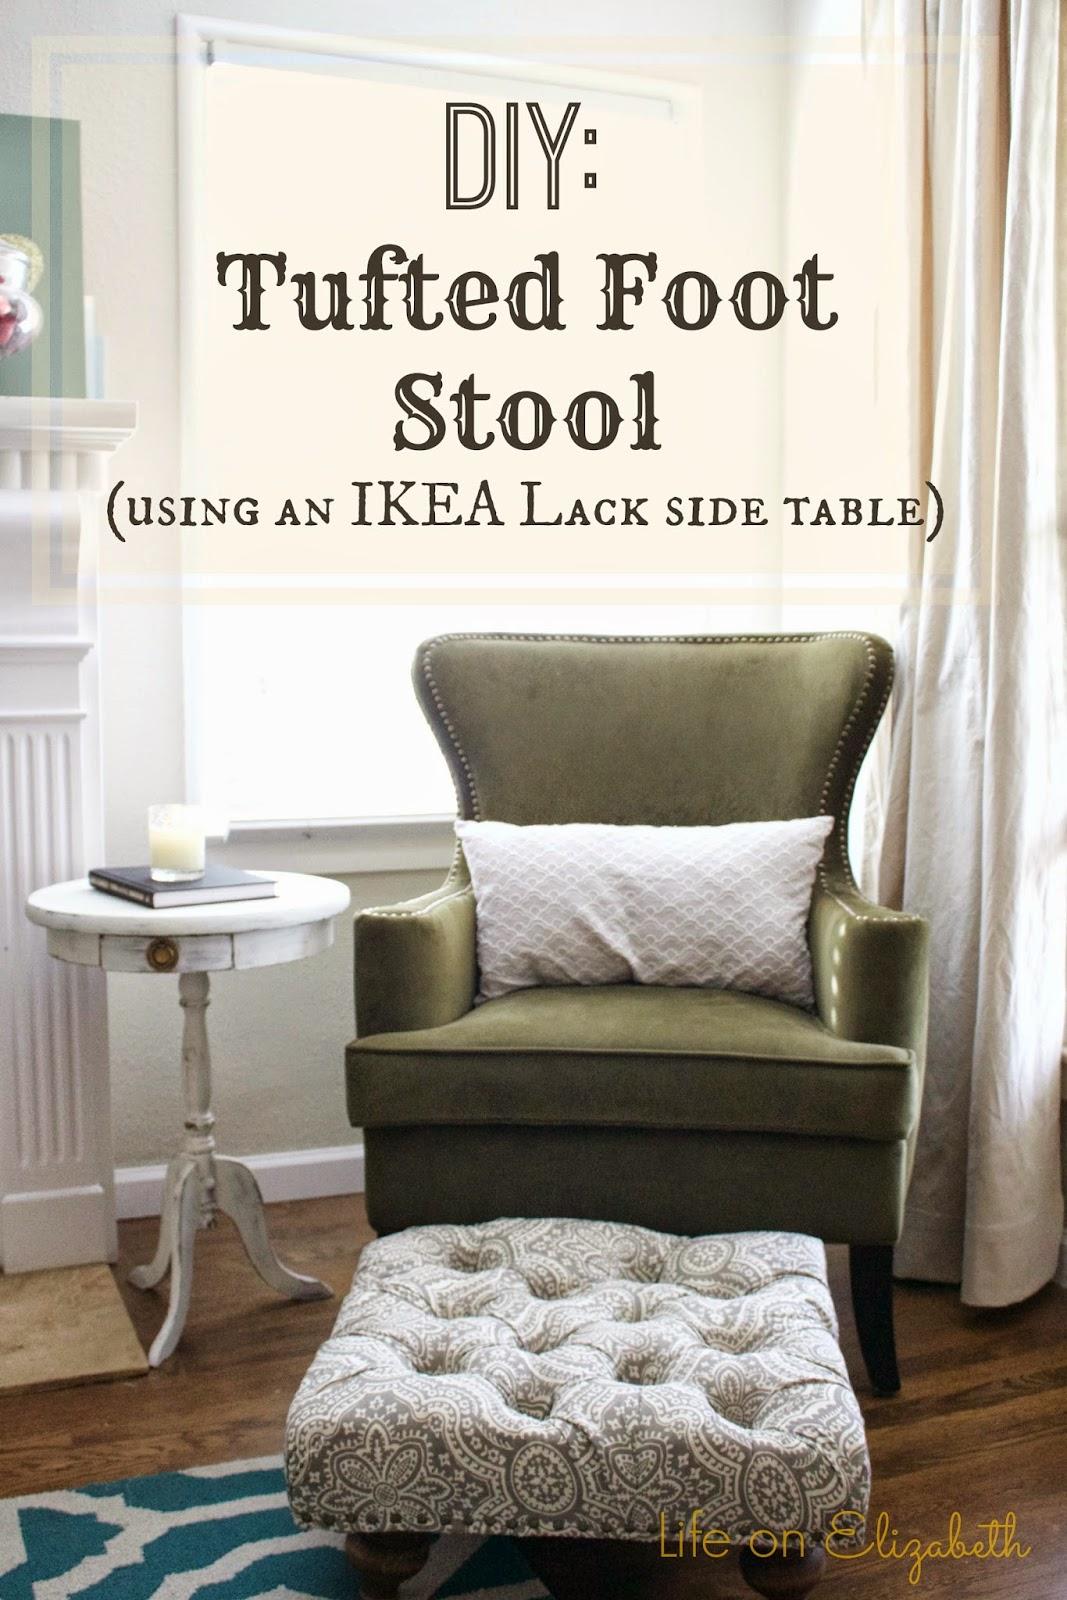 life on elizabeth diy tufted foot stool with ikea lack side table. Black Bedroom Furniture Sets. Home Design Ideas